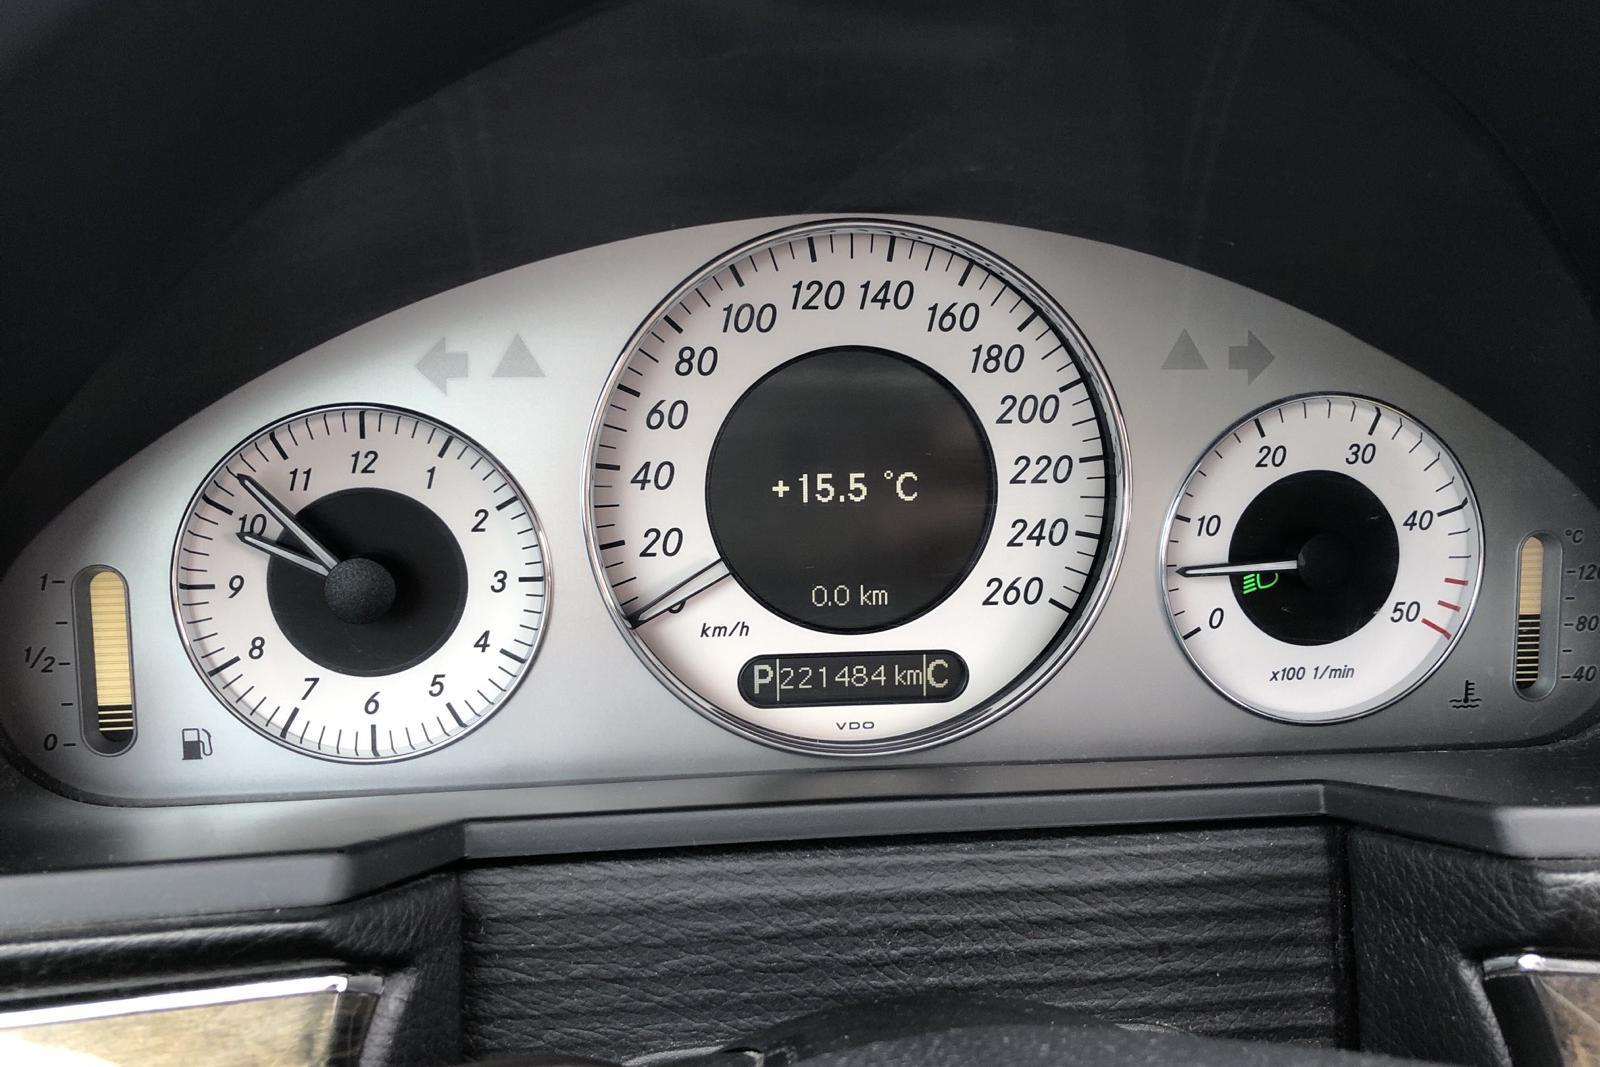 Mercedes E 320 CDI 4Matic Kombi W211 (224hk) - 22 148 mil - Automat - grå - 2007